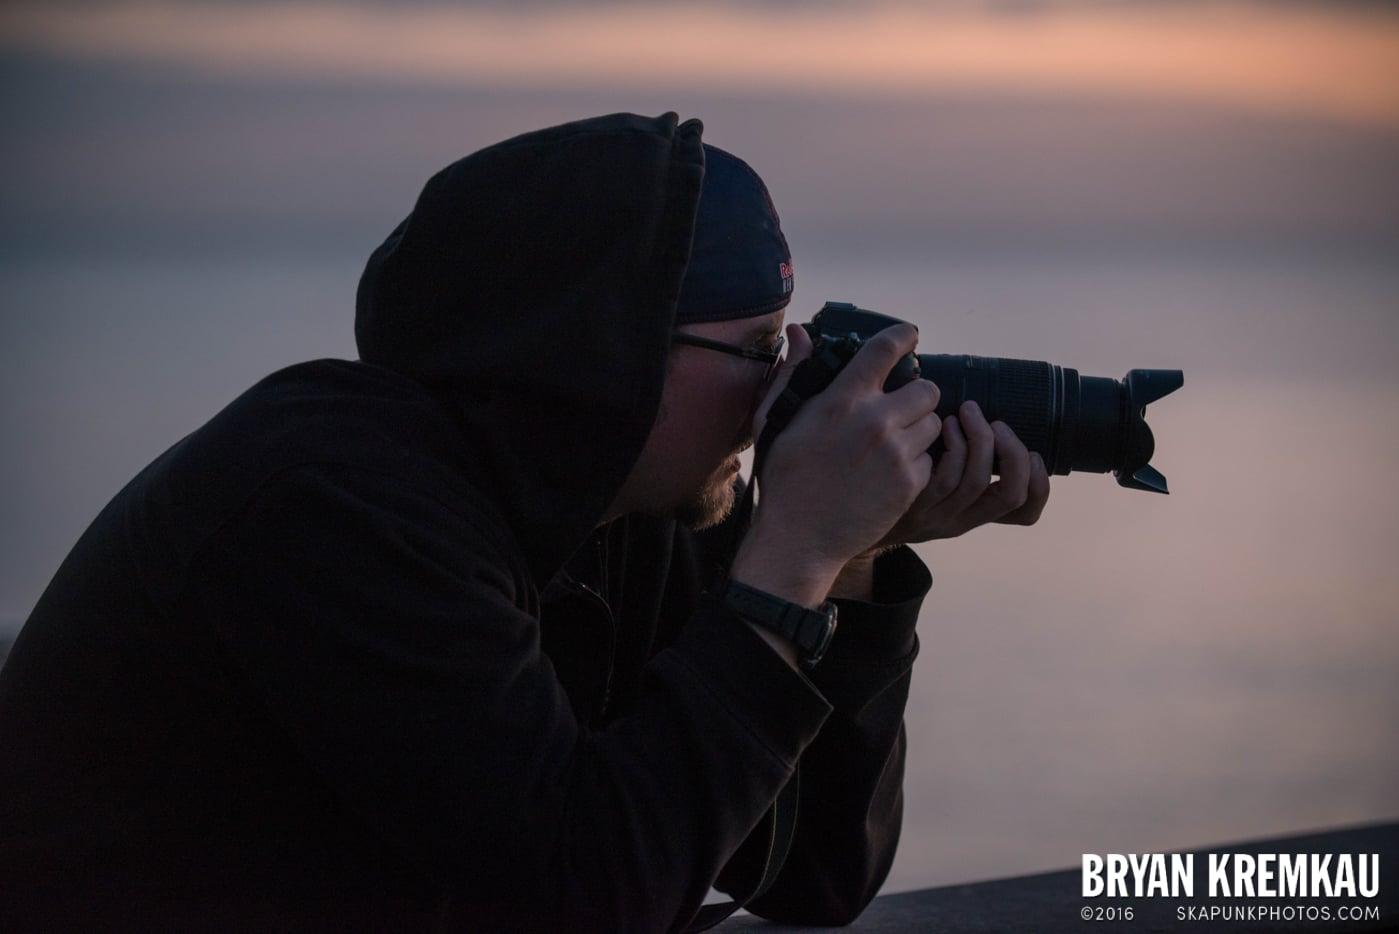 Sunsets, Astrophotography & Birds @ Venice, Florida - 10.25.14 - 11.5.14 (57)